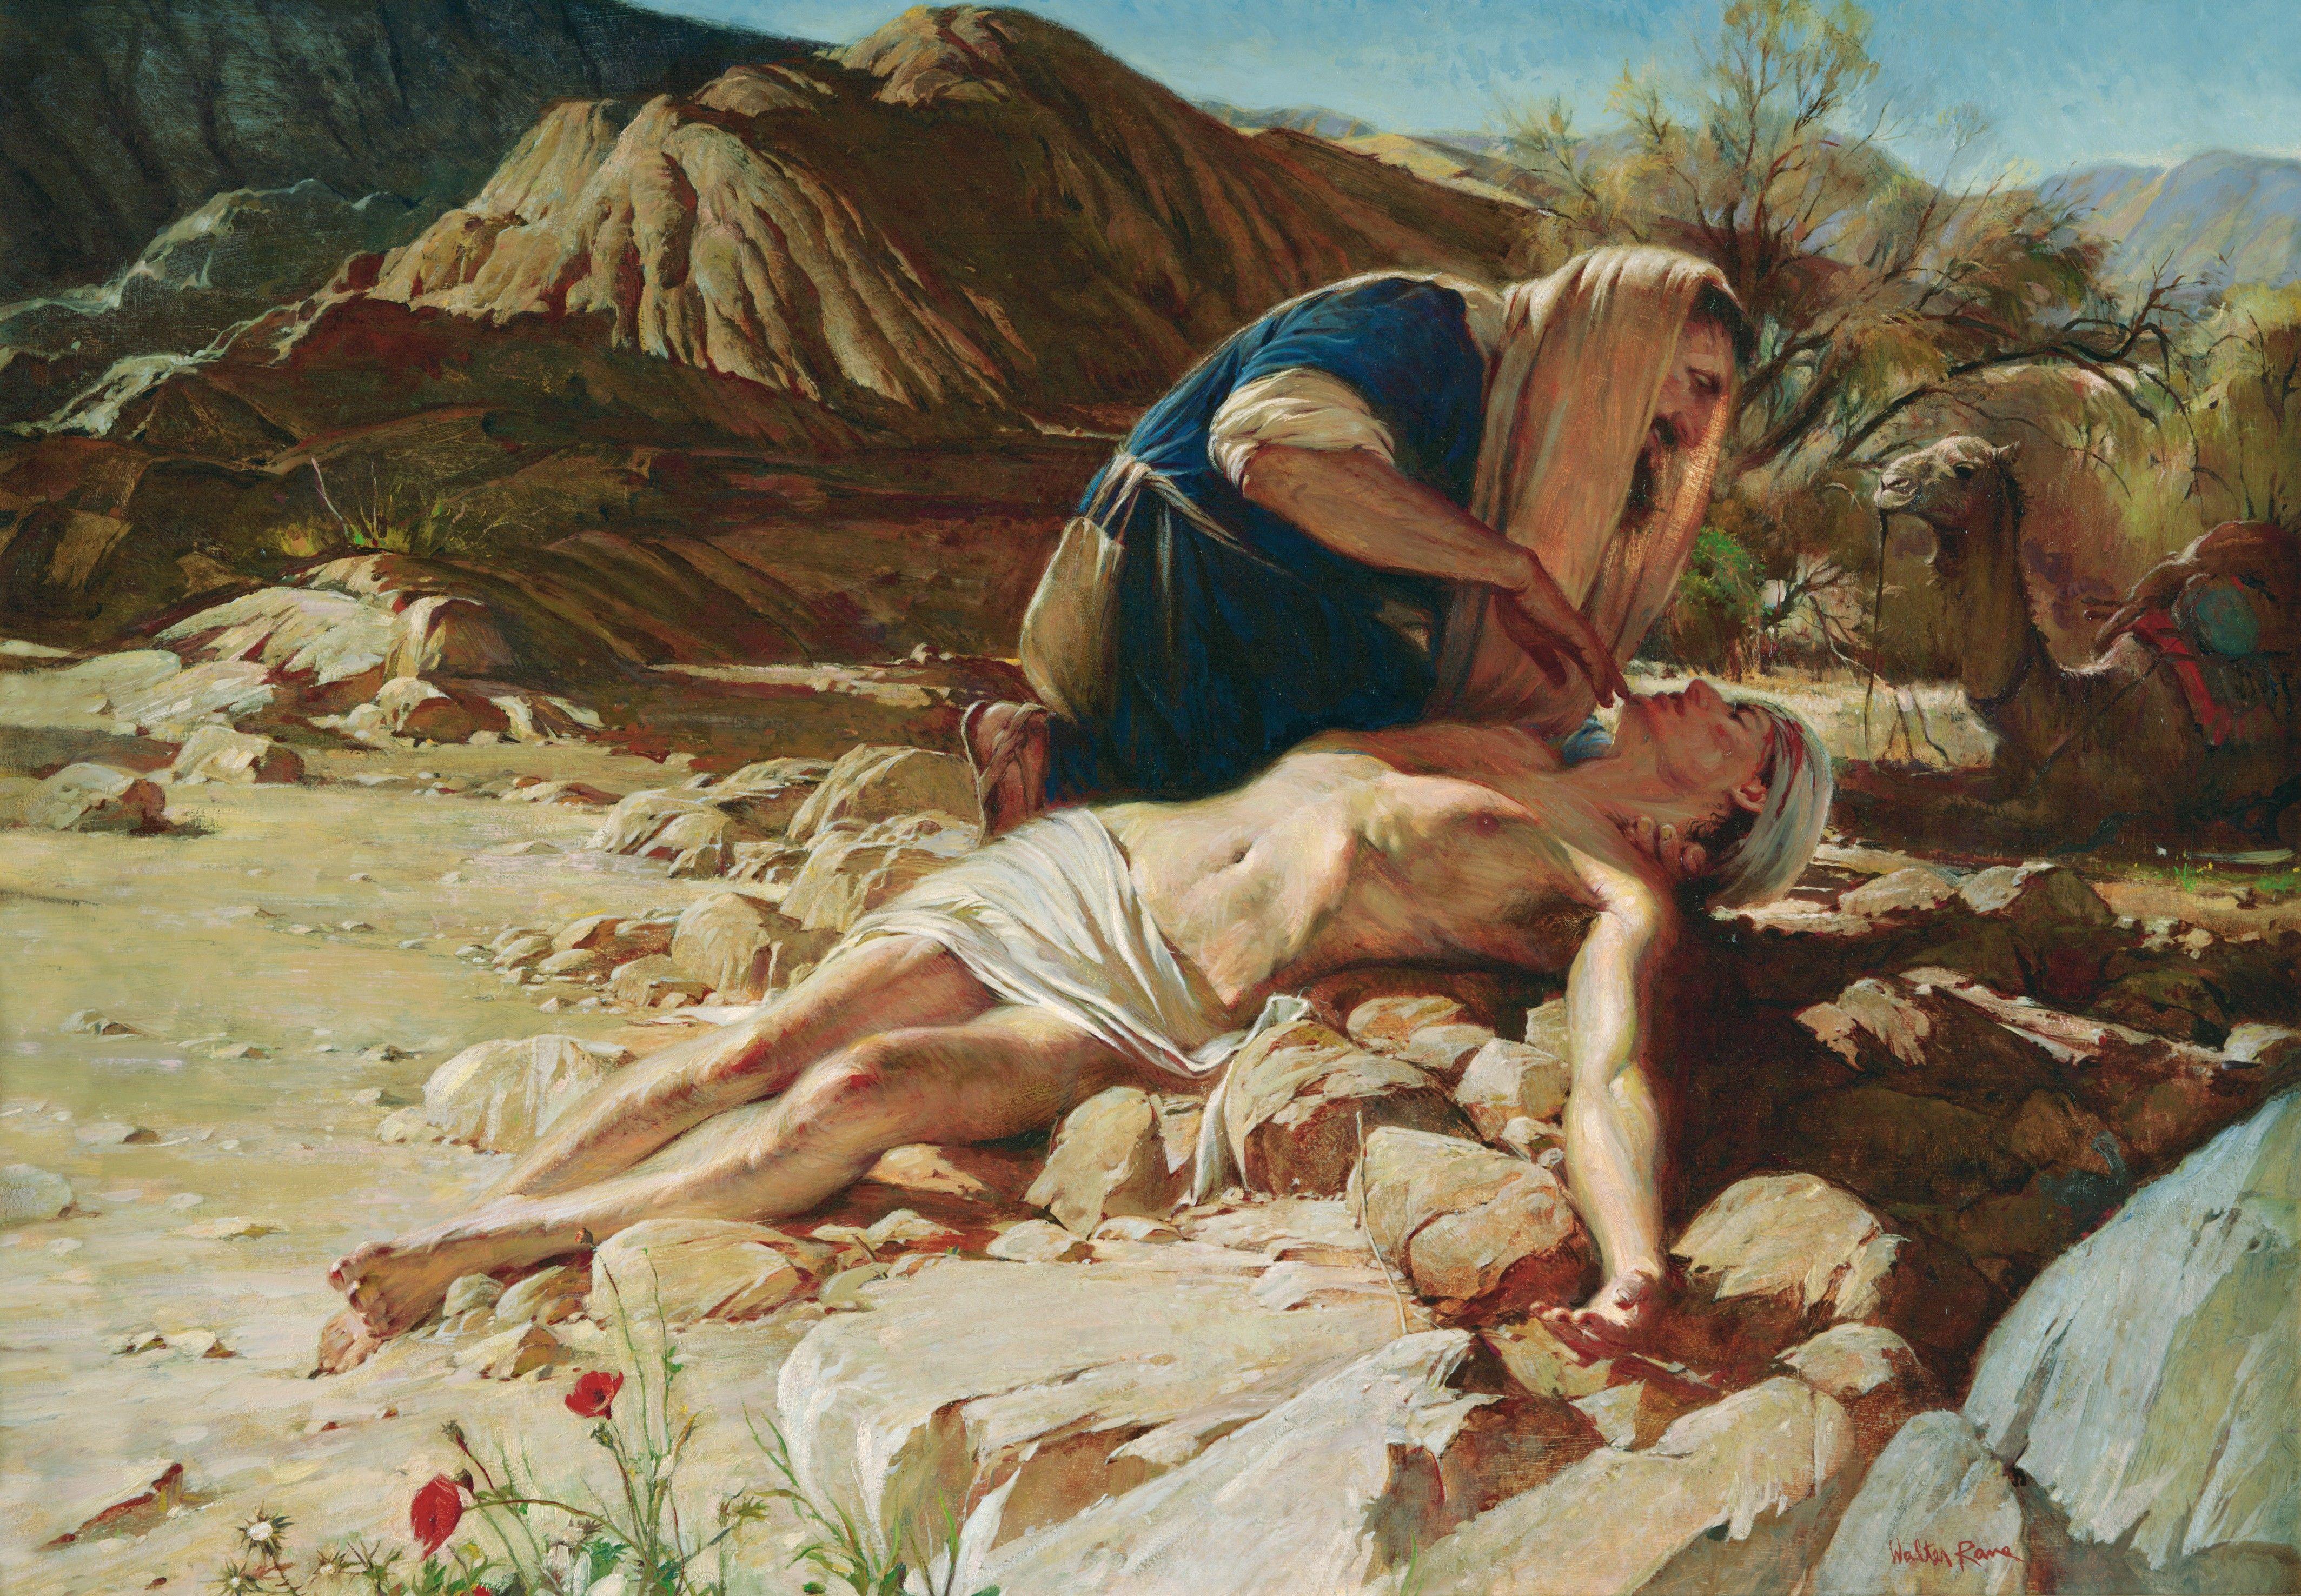 The Good Samaritan, by Walter Rane (62156); GAK 218; GAB 44; nursery manual lesson 18, page 78; Luke 10:25–37